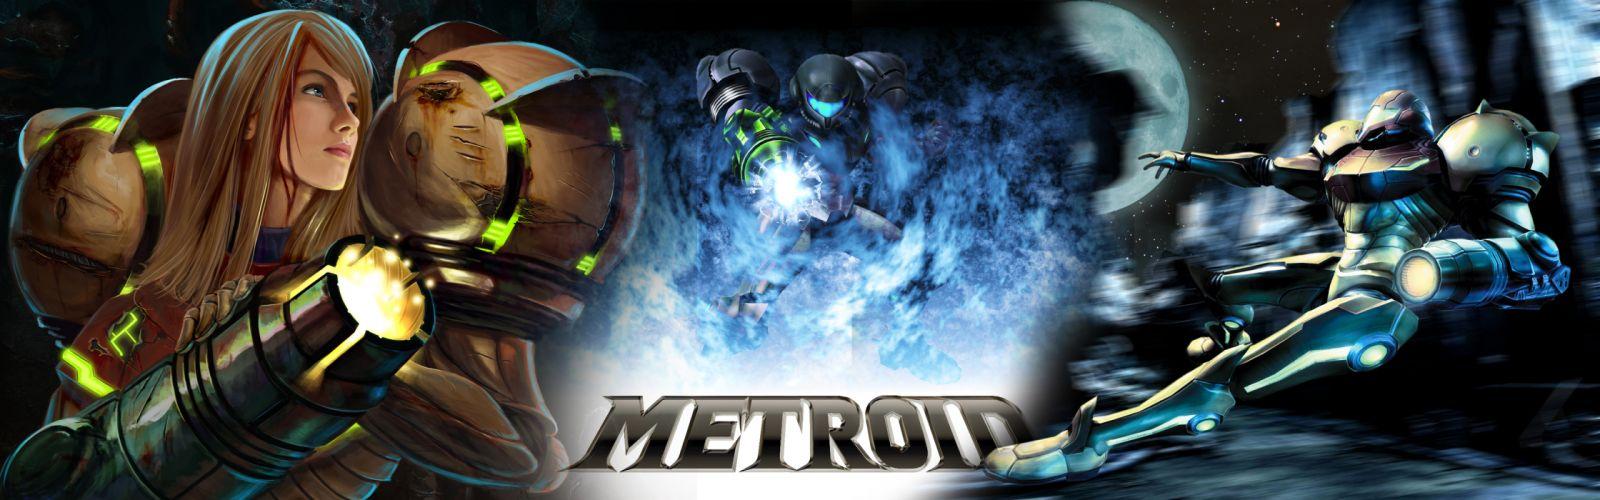 METROID sci-fi nintendo (46) wallpaper